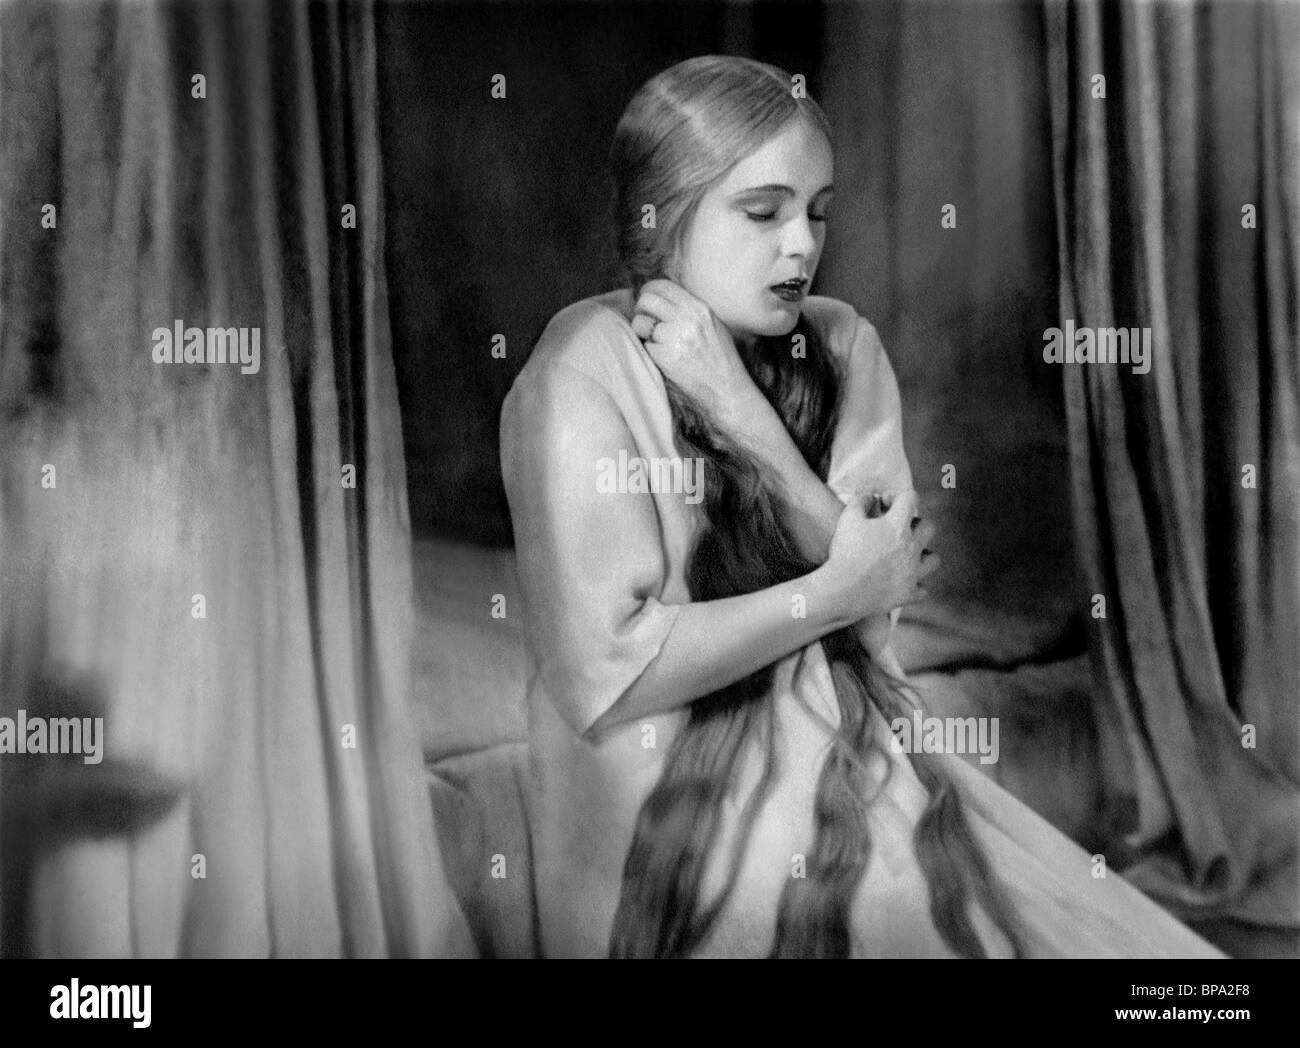 CAMILLA HORN FAUST: A GERMAN FOLK LEGEND (1926) - Stock Image